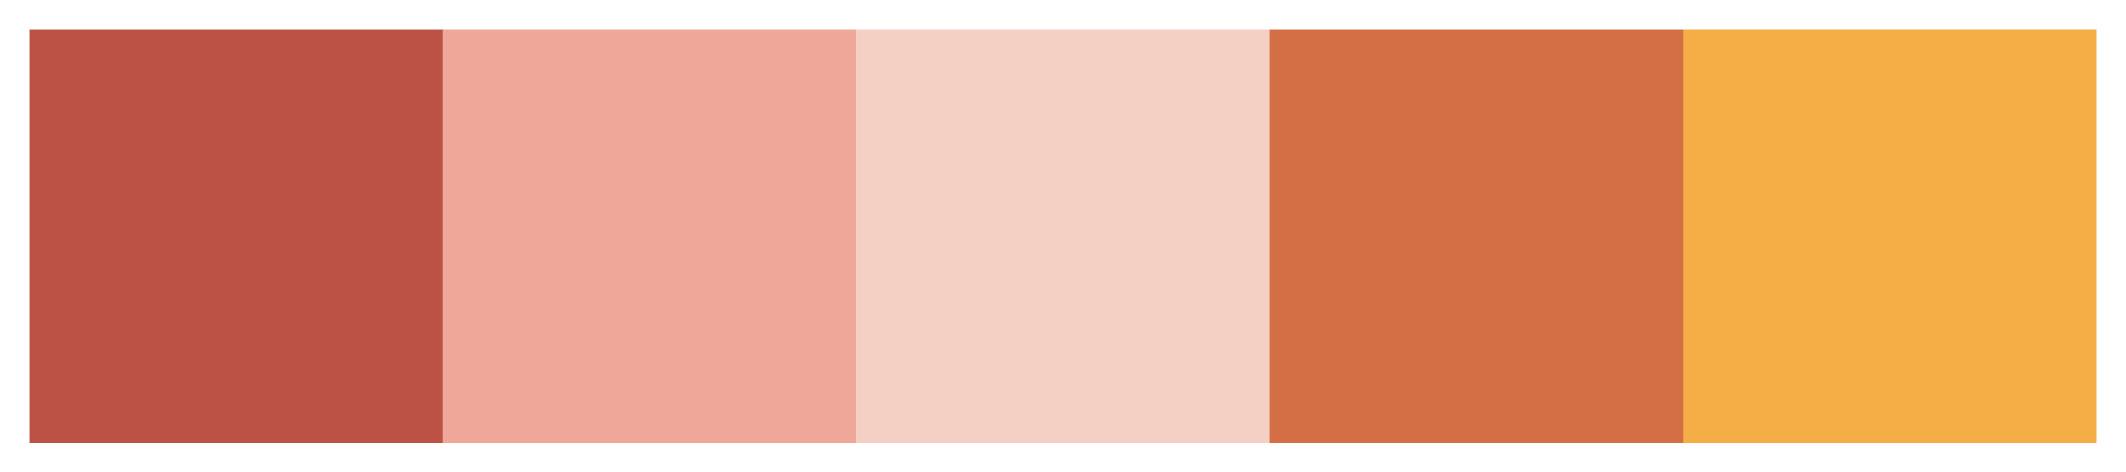 formex färgschema 2019